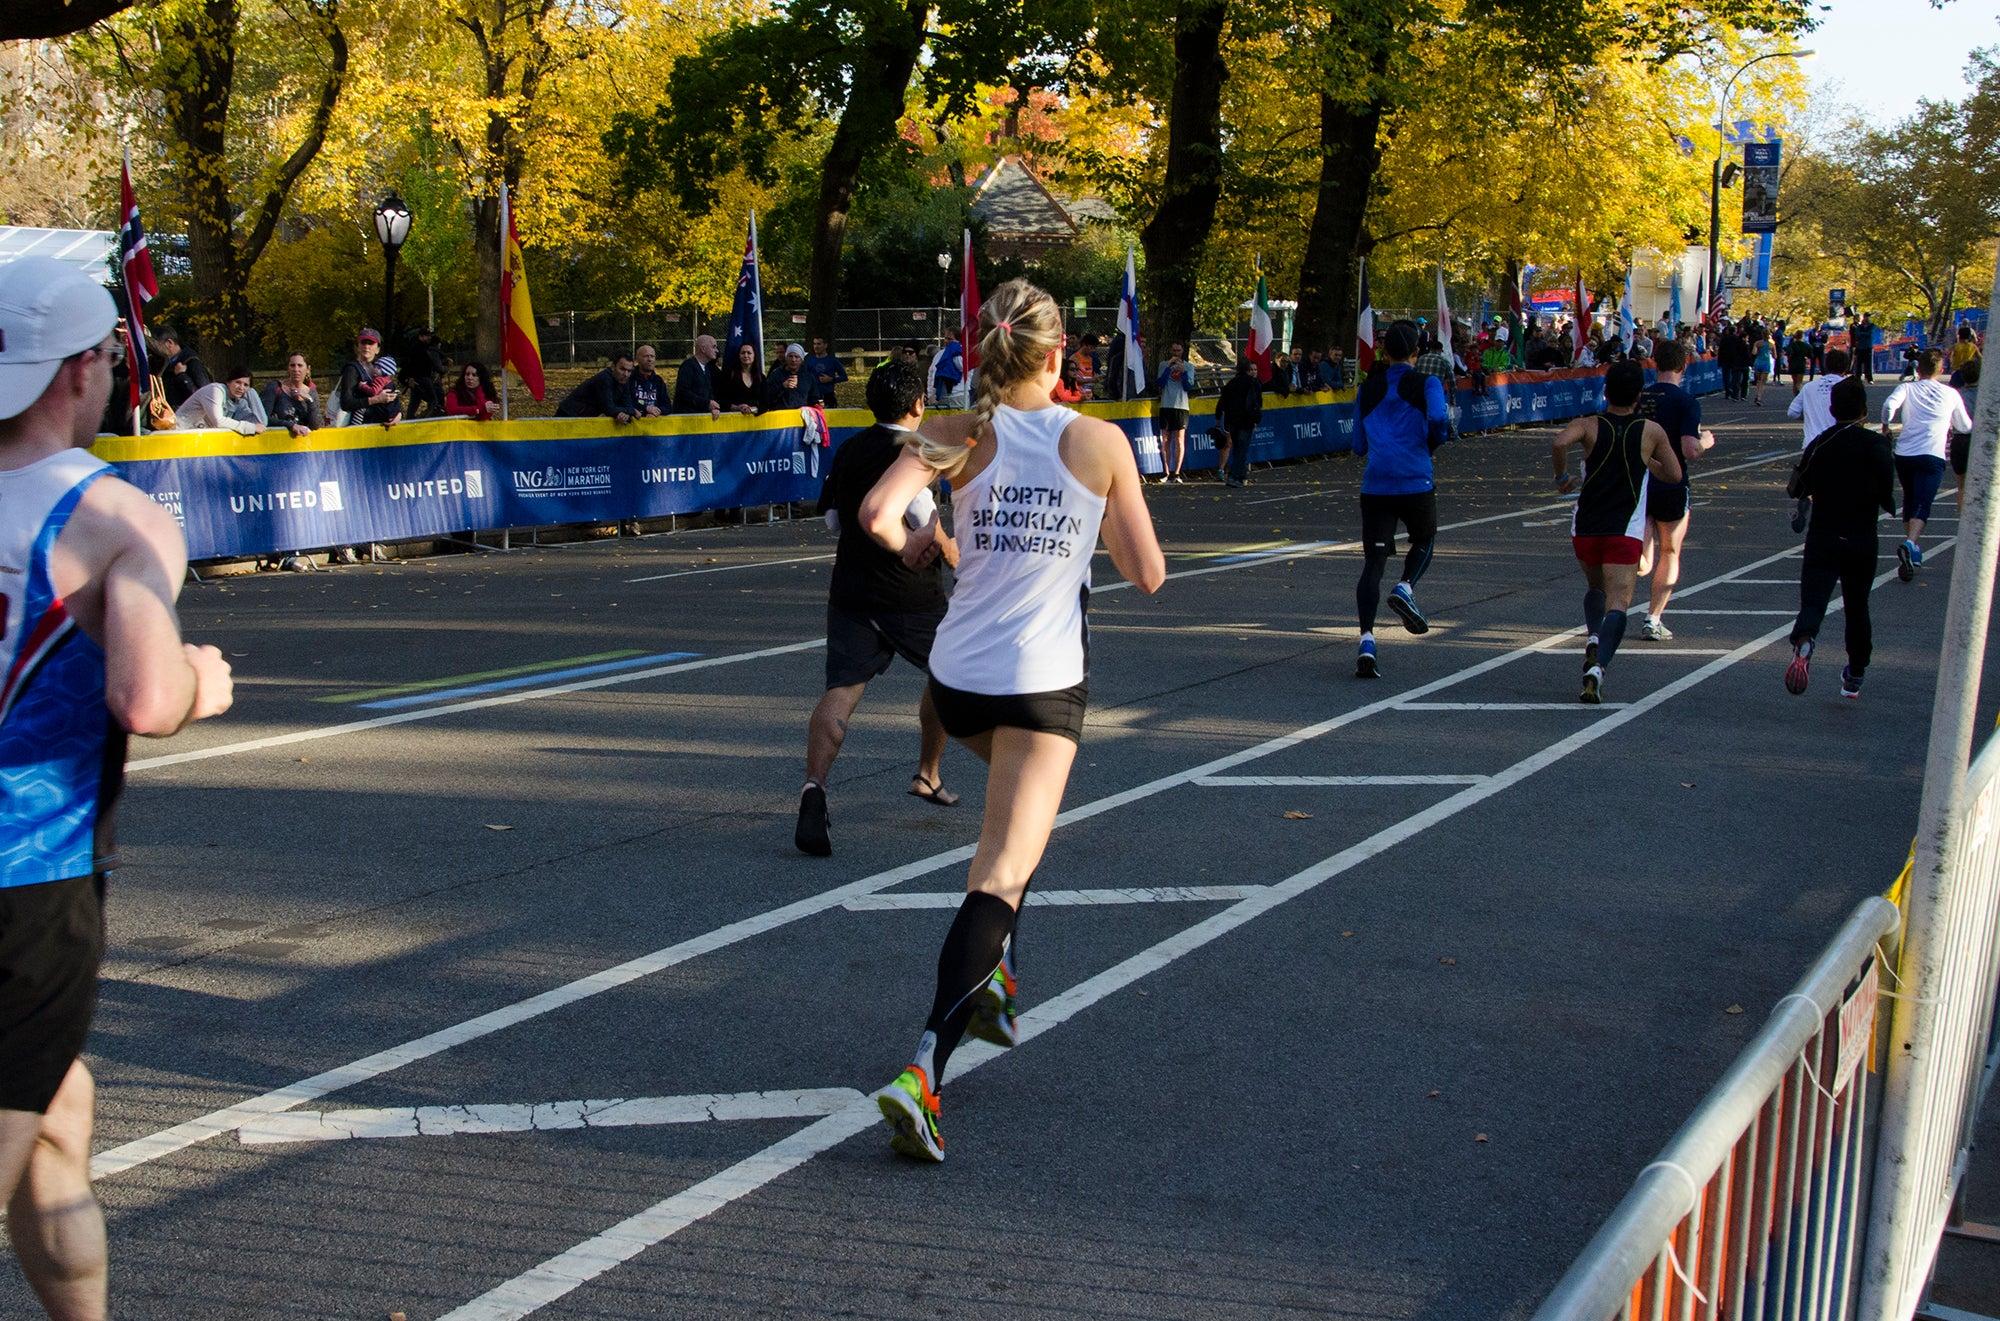 Finishing race strong